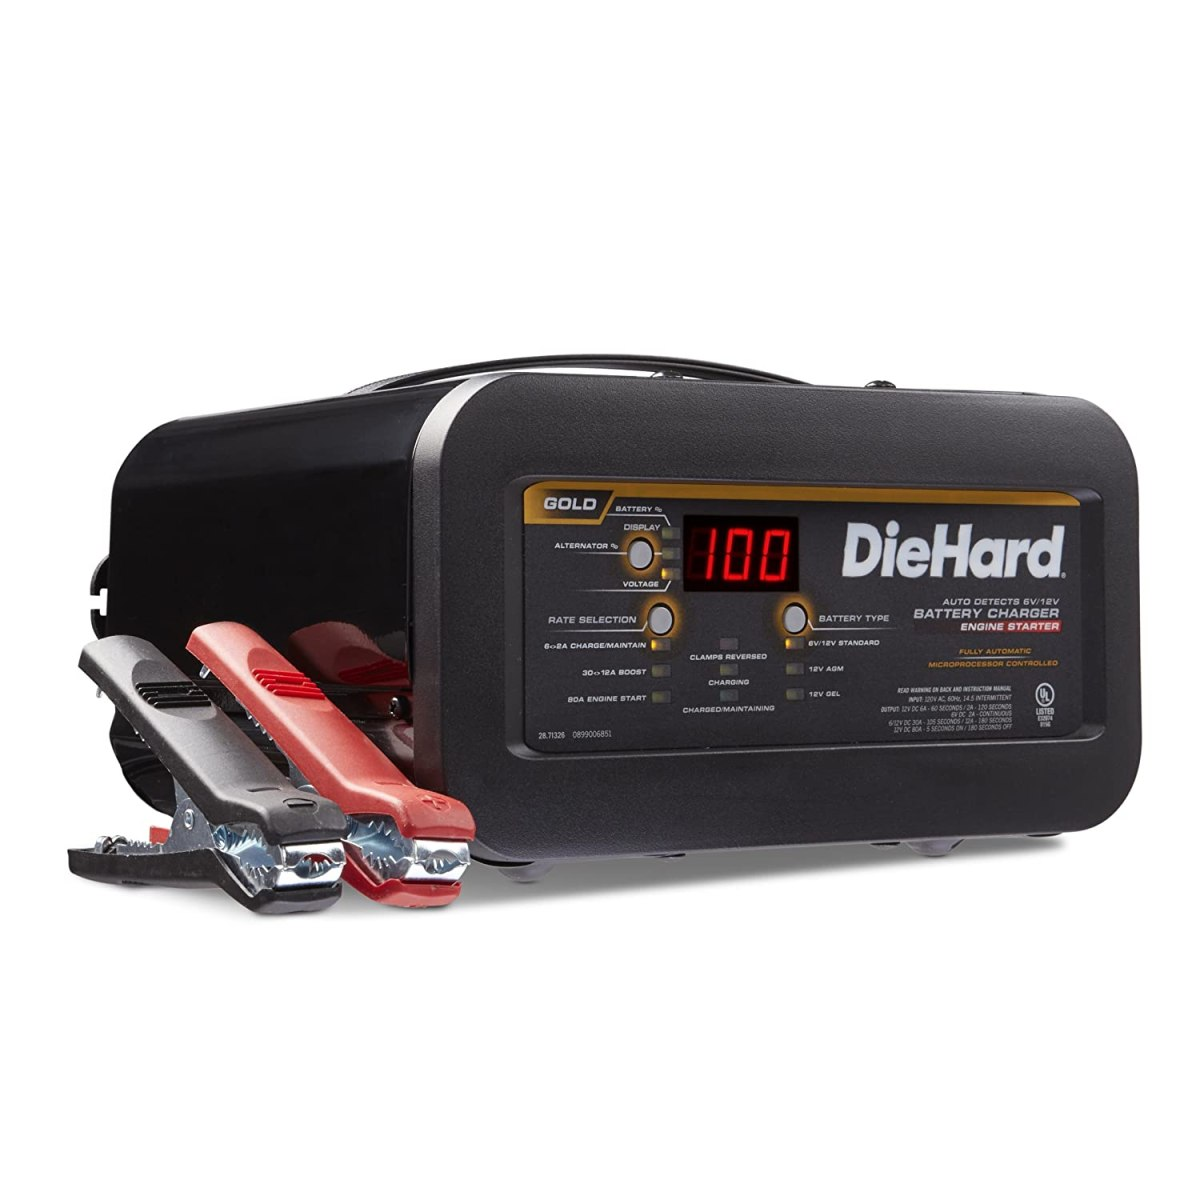 best jump starters DieHard 71326 6/12V Gold Shelf Smart Battery Charger and 12/80A Engine Starter